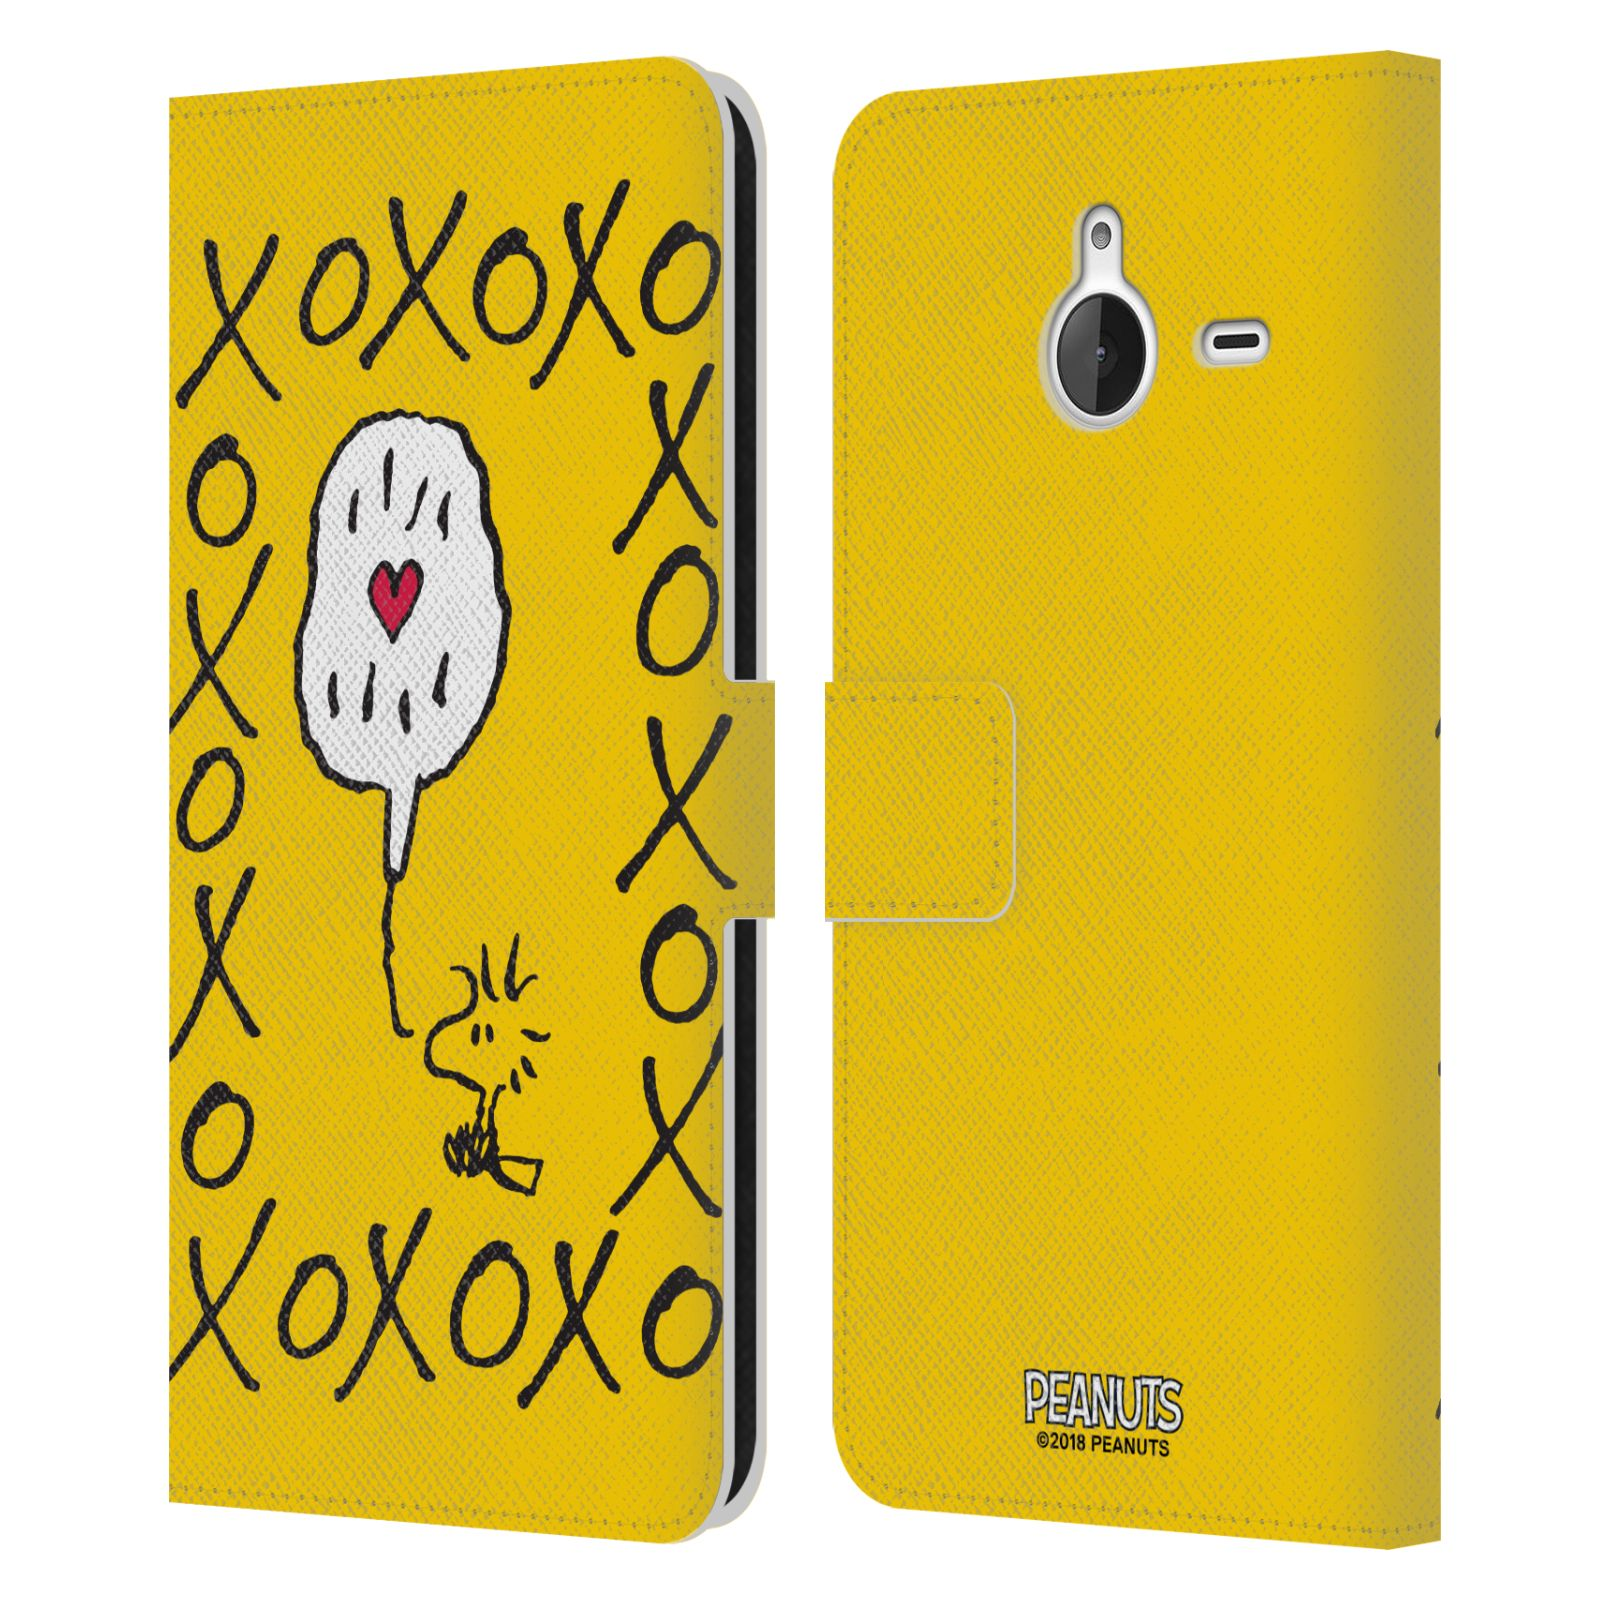 Pouzdro na mobil Nokia Lumia 640 XL - Head Case - Peanuts - Woodstock ptáček XOXO